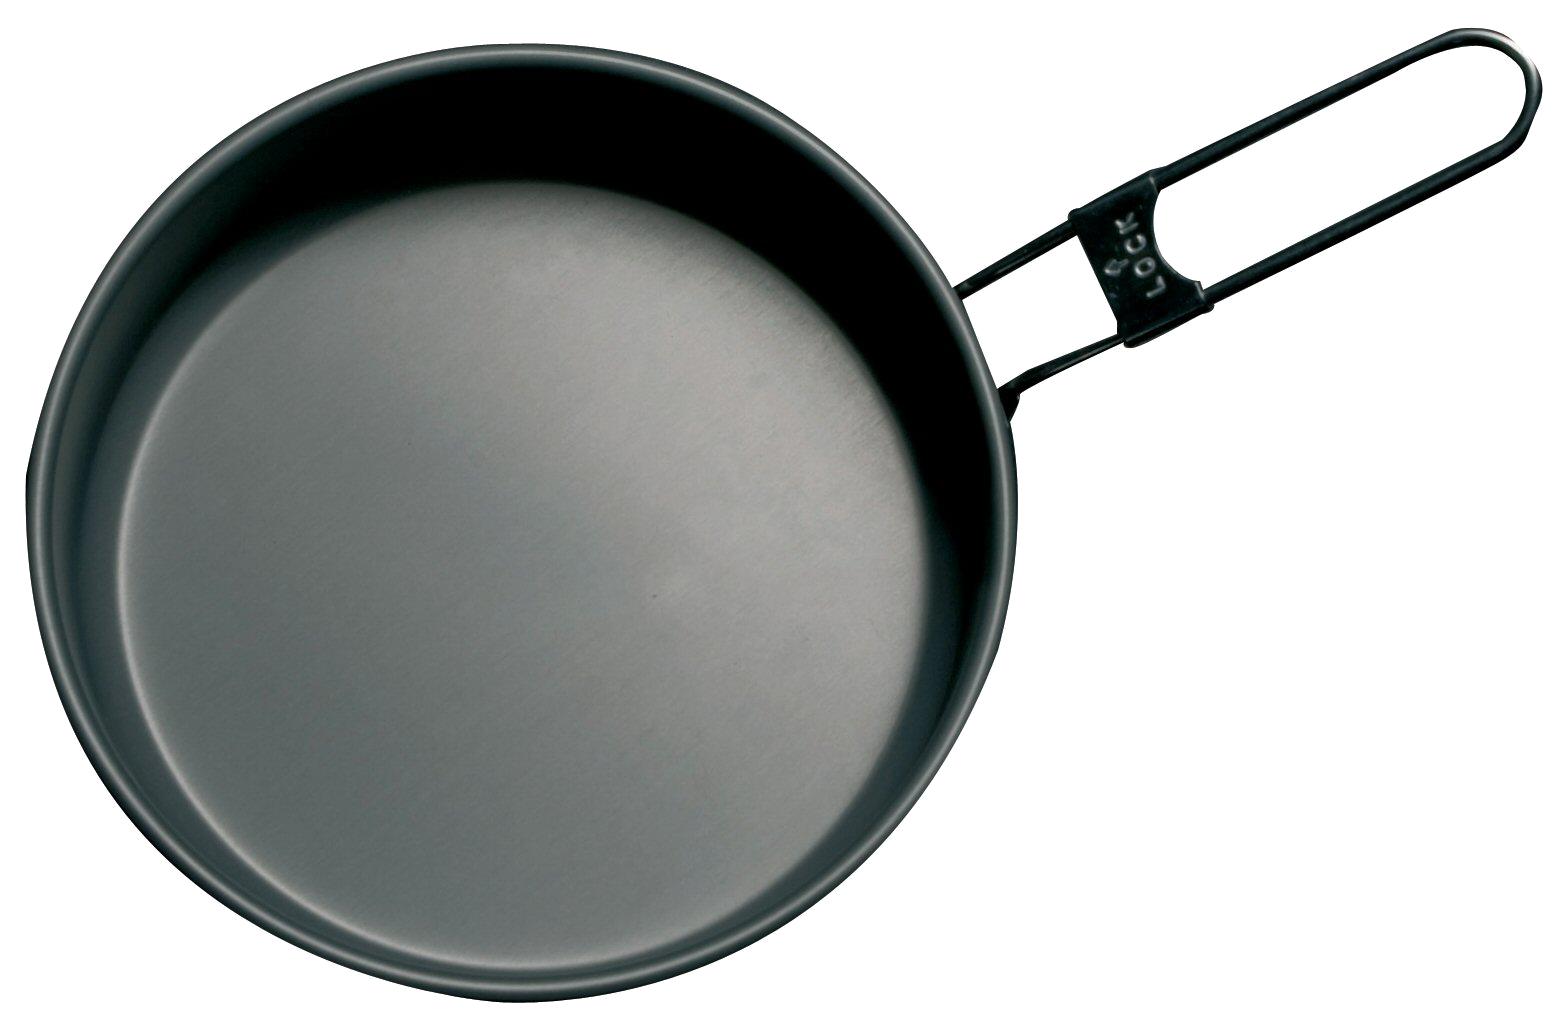 1568x1012 Frying Pan Images Free Download Image Clip Art 2